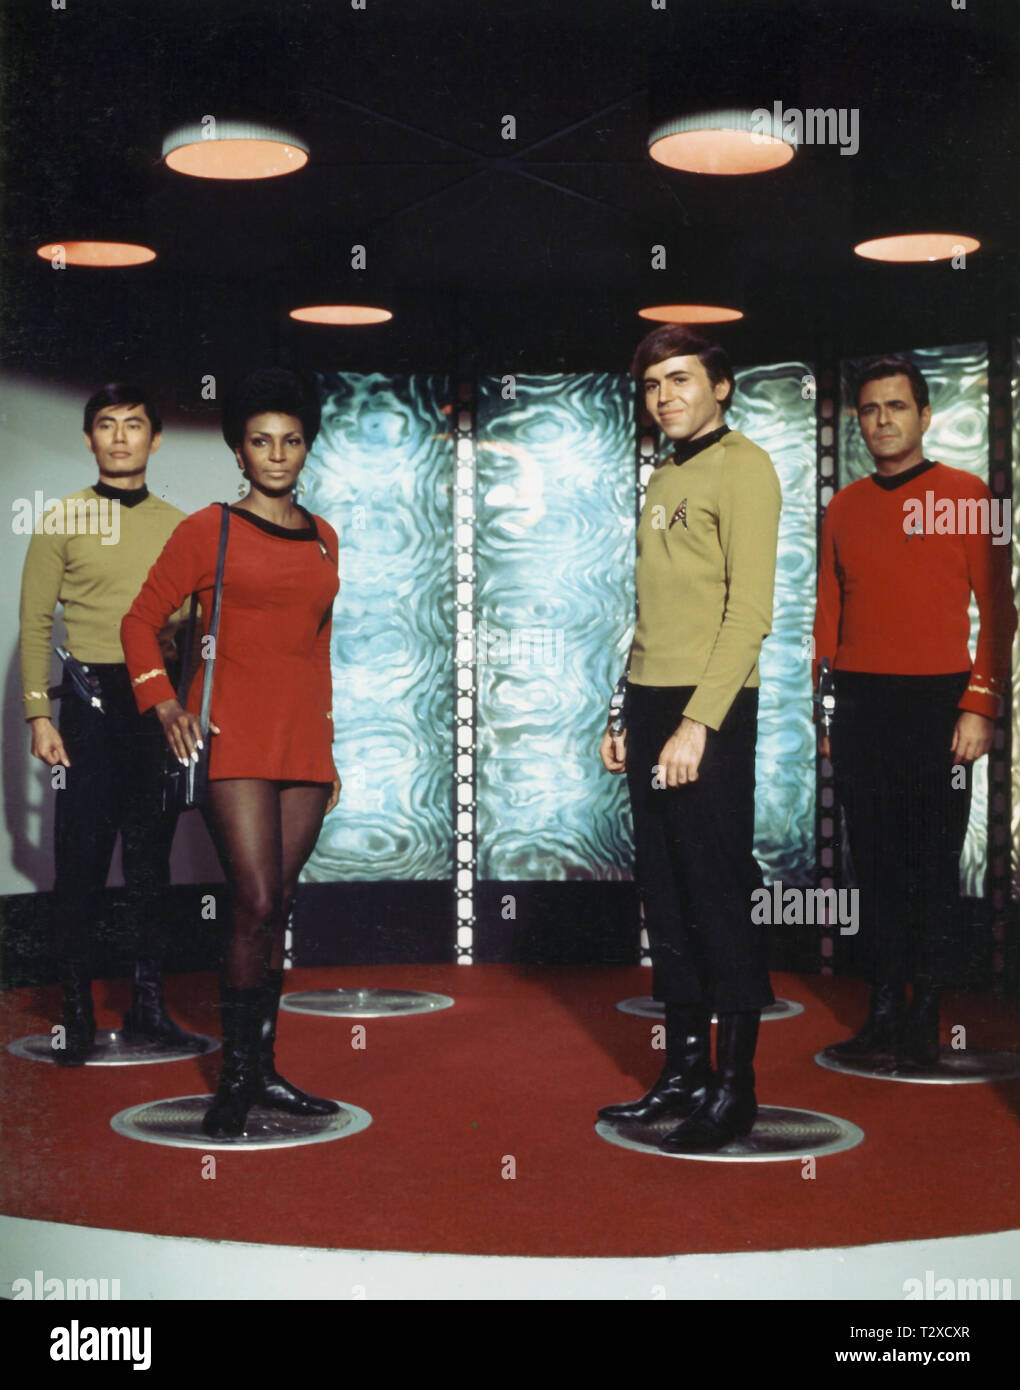 GEORGE TAKEI, NICHELLE NICHOLS, WALTER KOENIG, JAMES DOOHAN, STAR TREK, 1966 - Stock Image